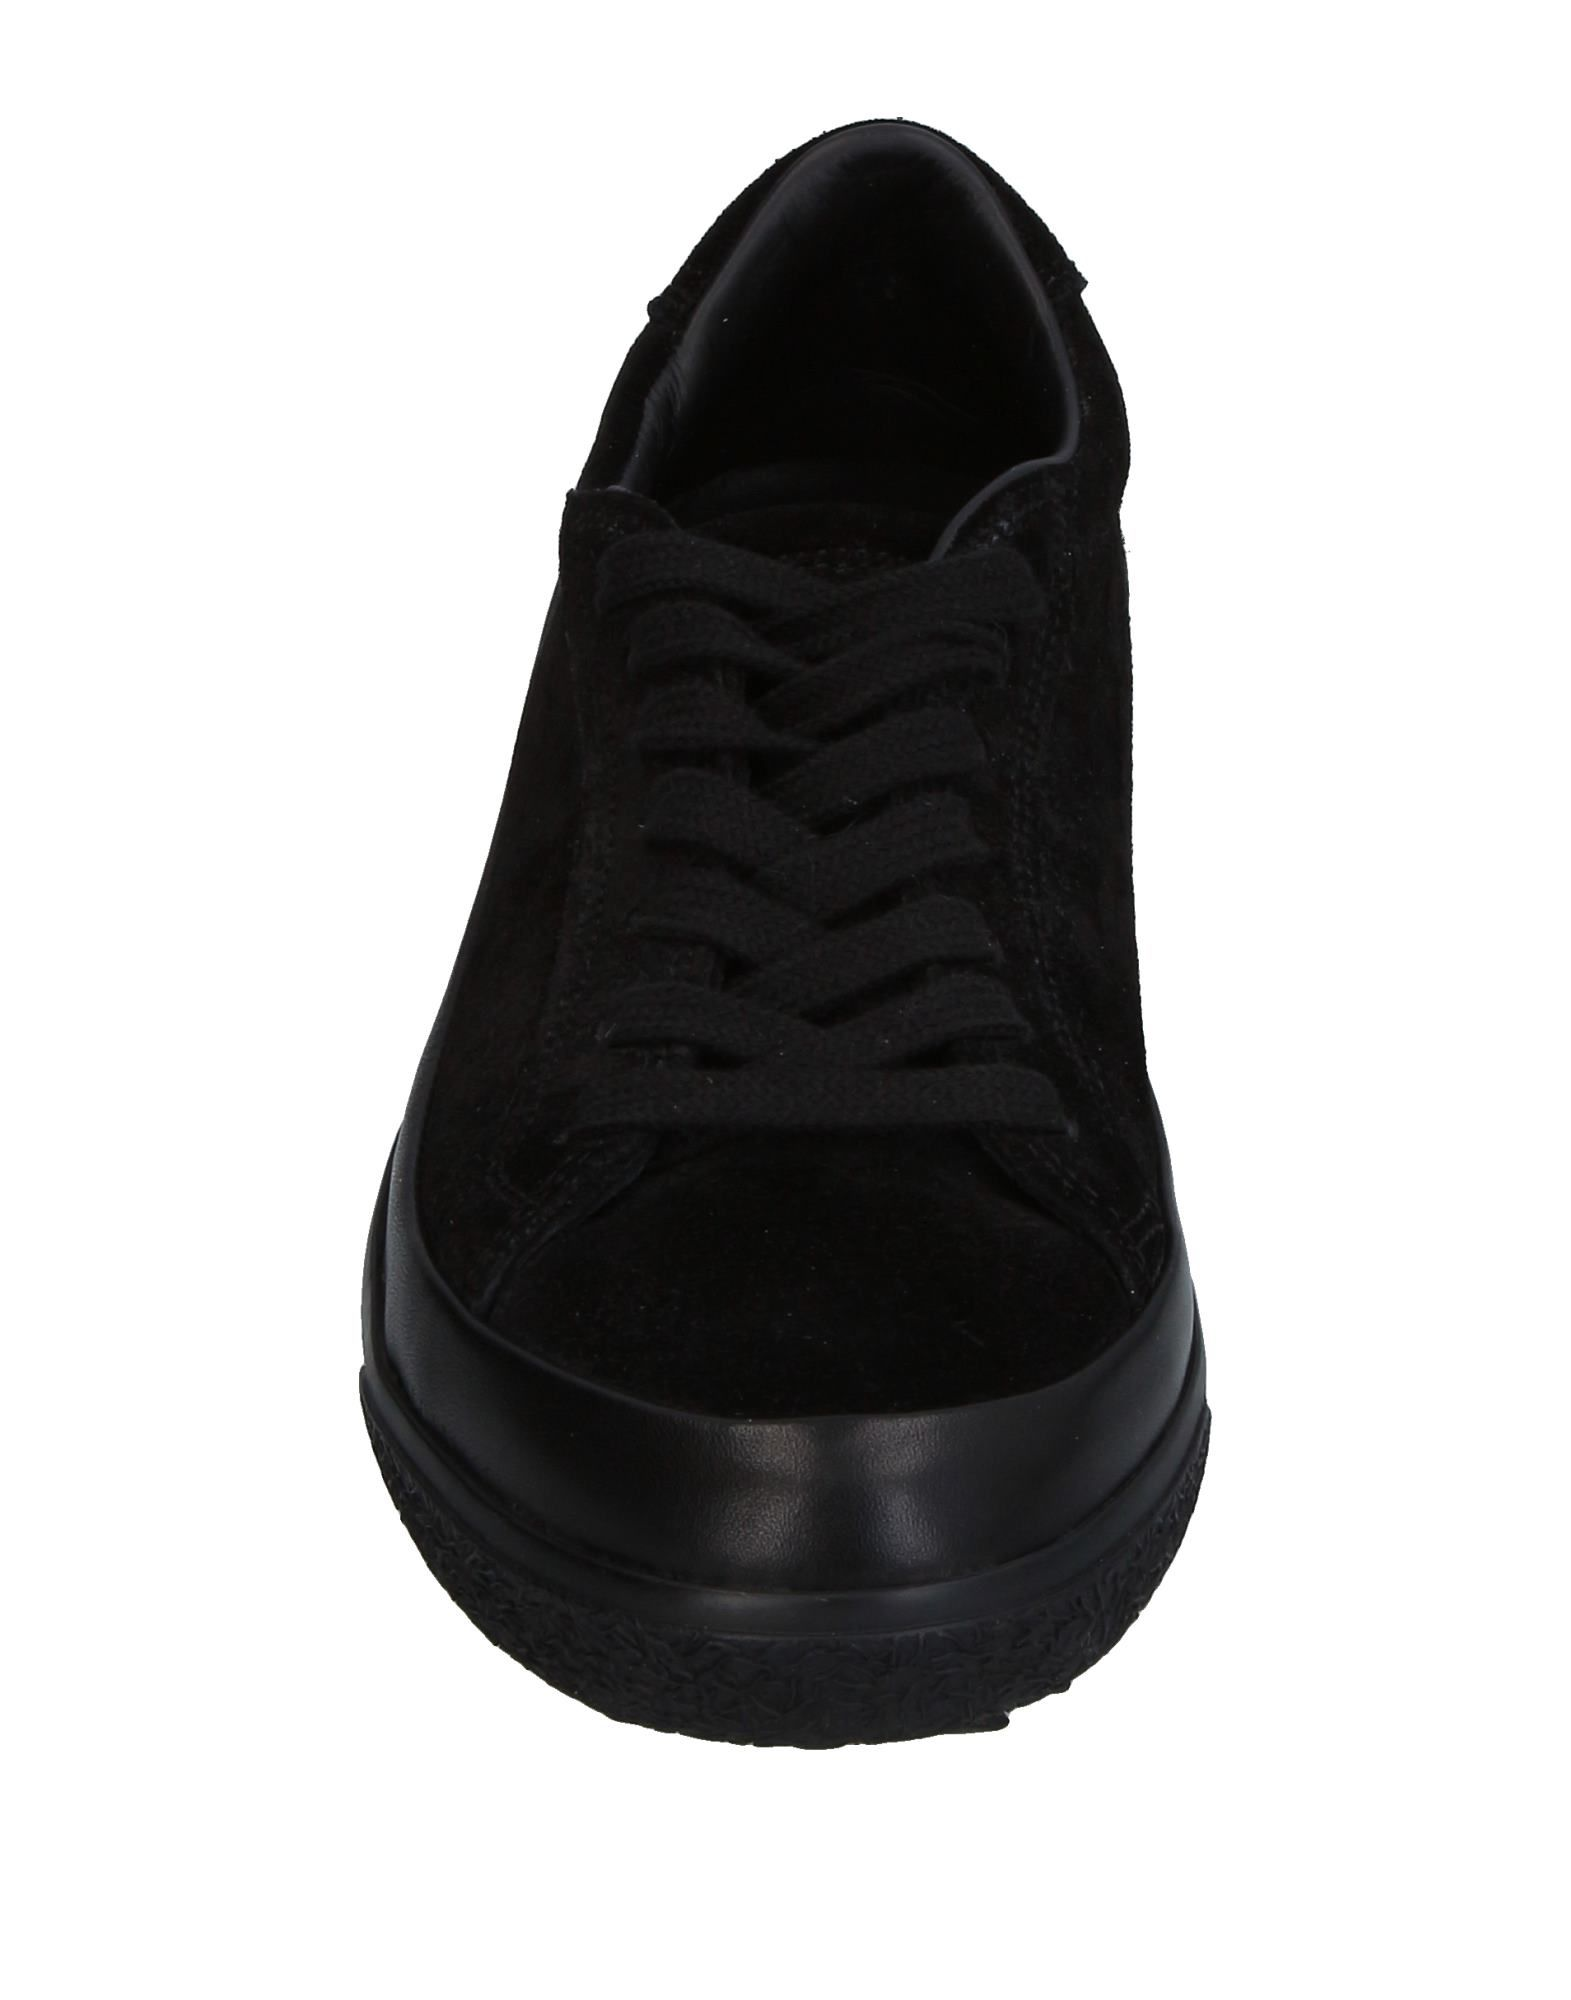 Stilvolle D'oro billige Schuhe Pantofola D'oro Stilvolle Sneakers Damen  11378594NH 4b54ca